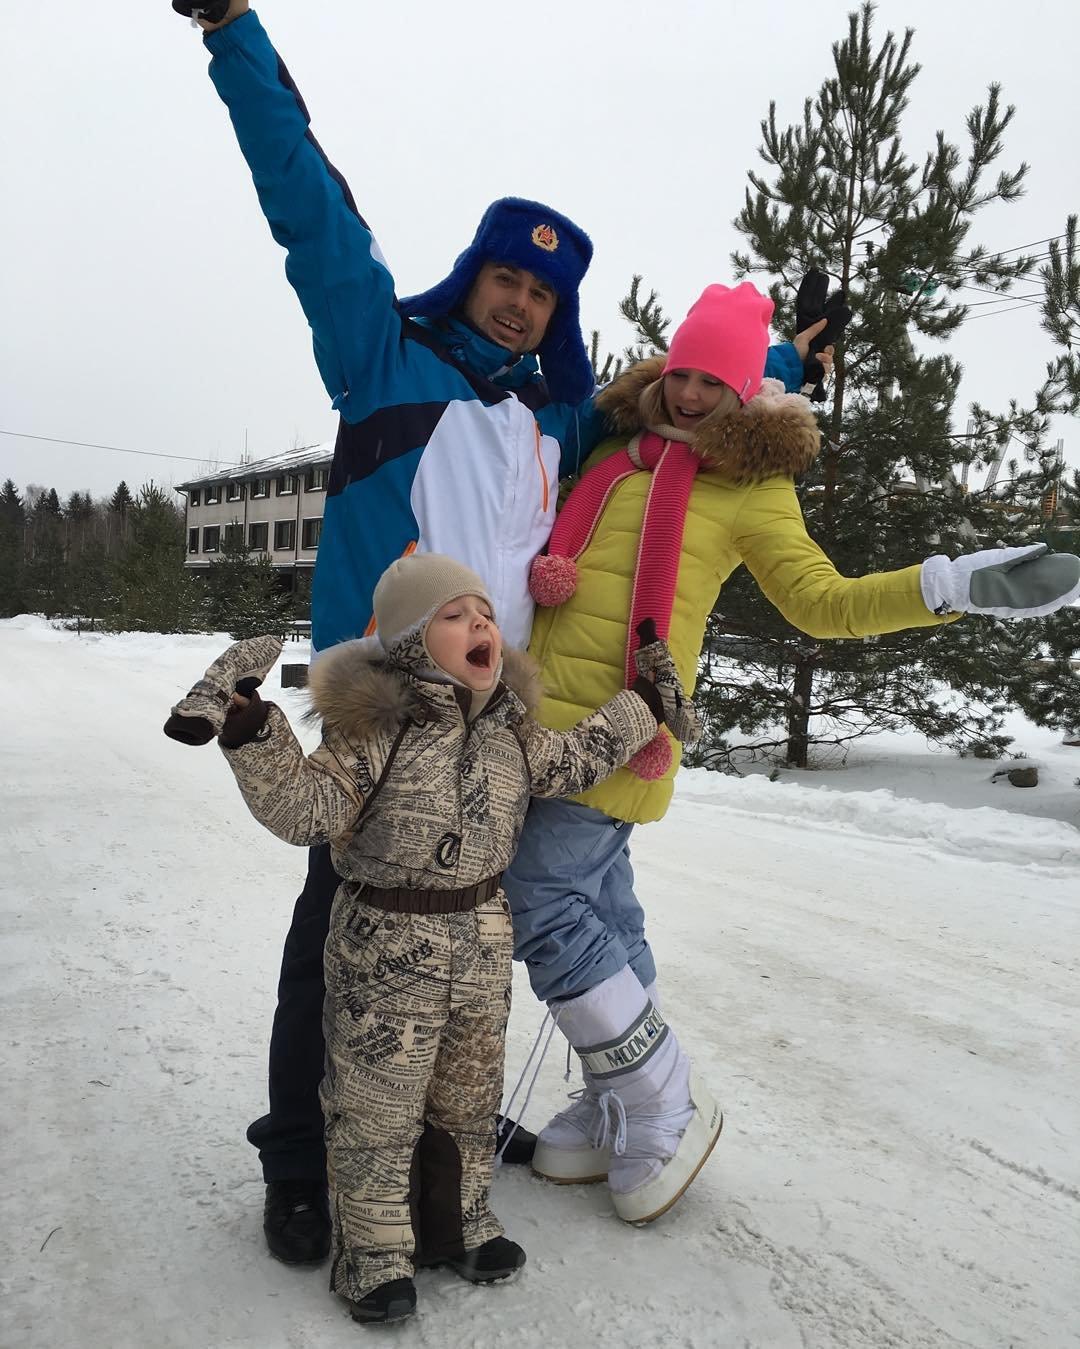 Беременная Дарья Пынзарь отдыхает с мужем и сыном в ...: http://zvezdi.ru/news/house/40-beremennaya-darya-pynzar-otdyhaet-s-muzhem-i-synom-v-sorochanah.html